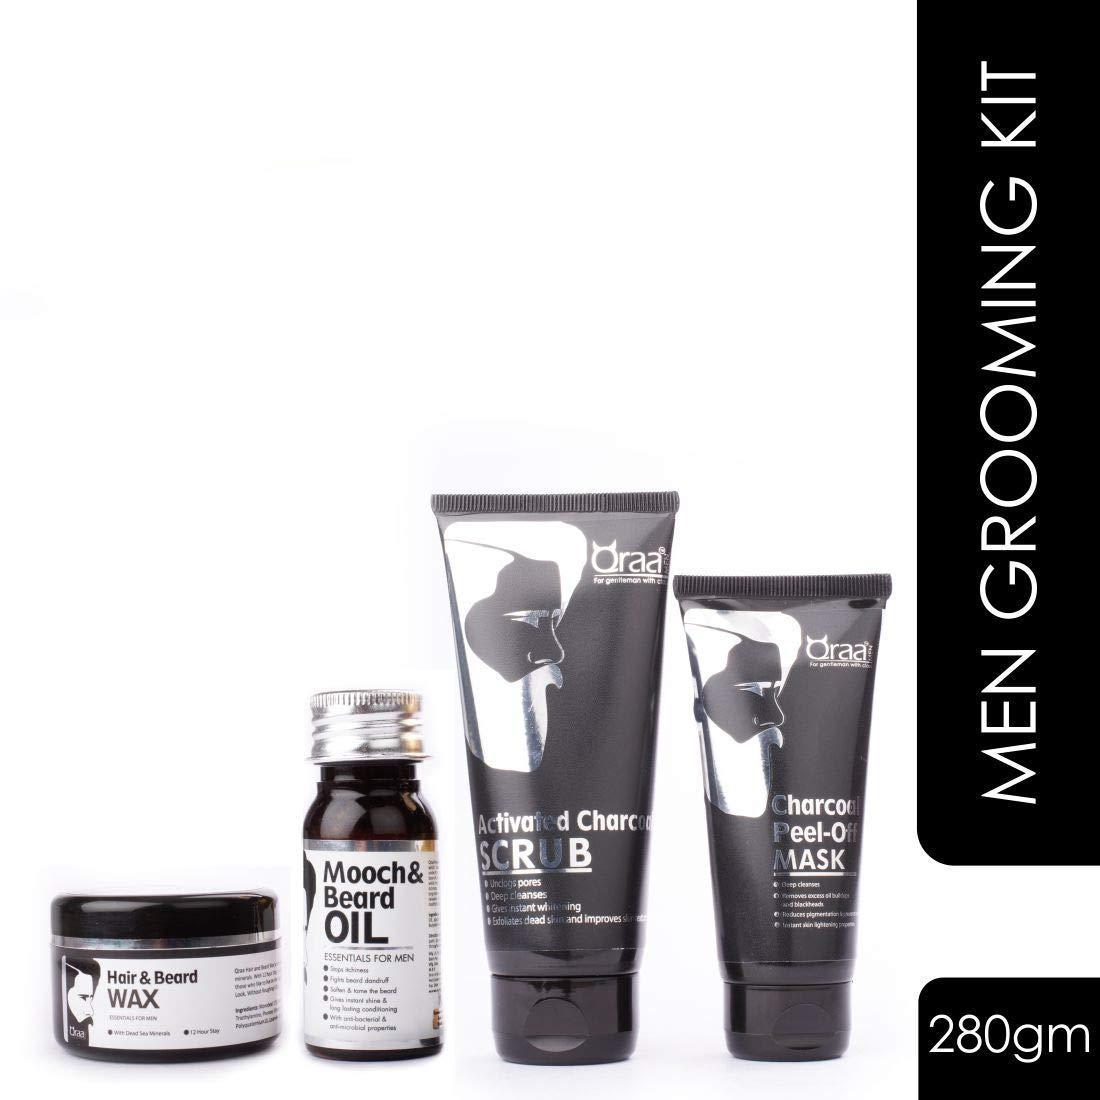 Qraa Men Grooming Kit - Pack of Charcoal Scrub/Charcoal Peel Off/Hair and Beard Wax/Mooch and Beard Oil,280g